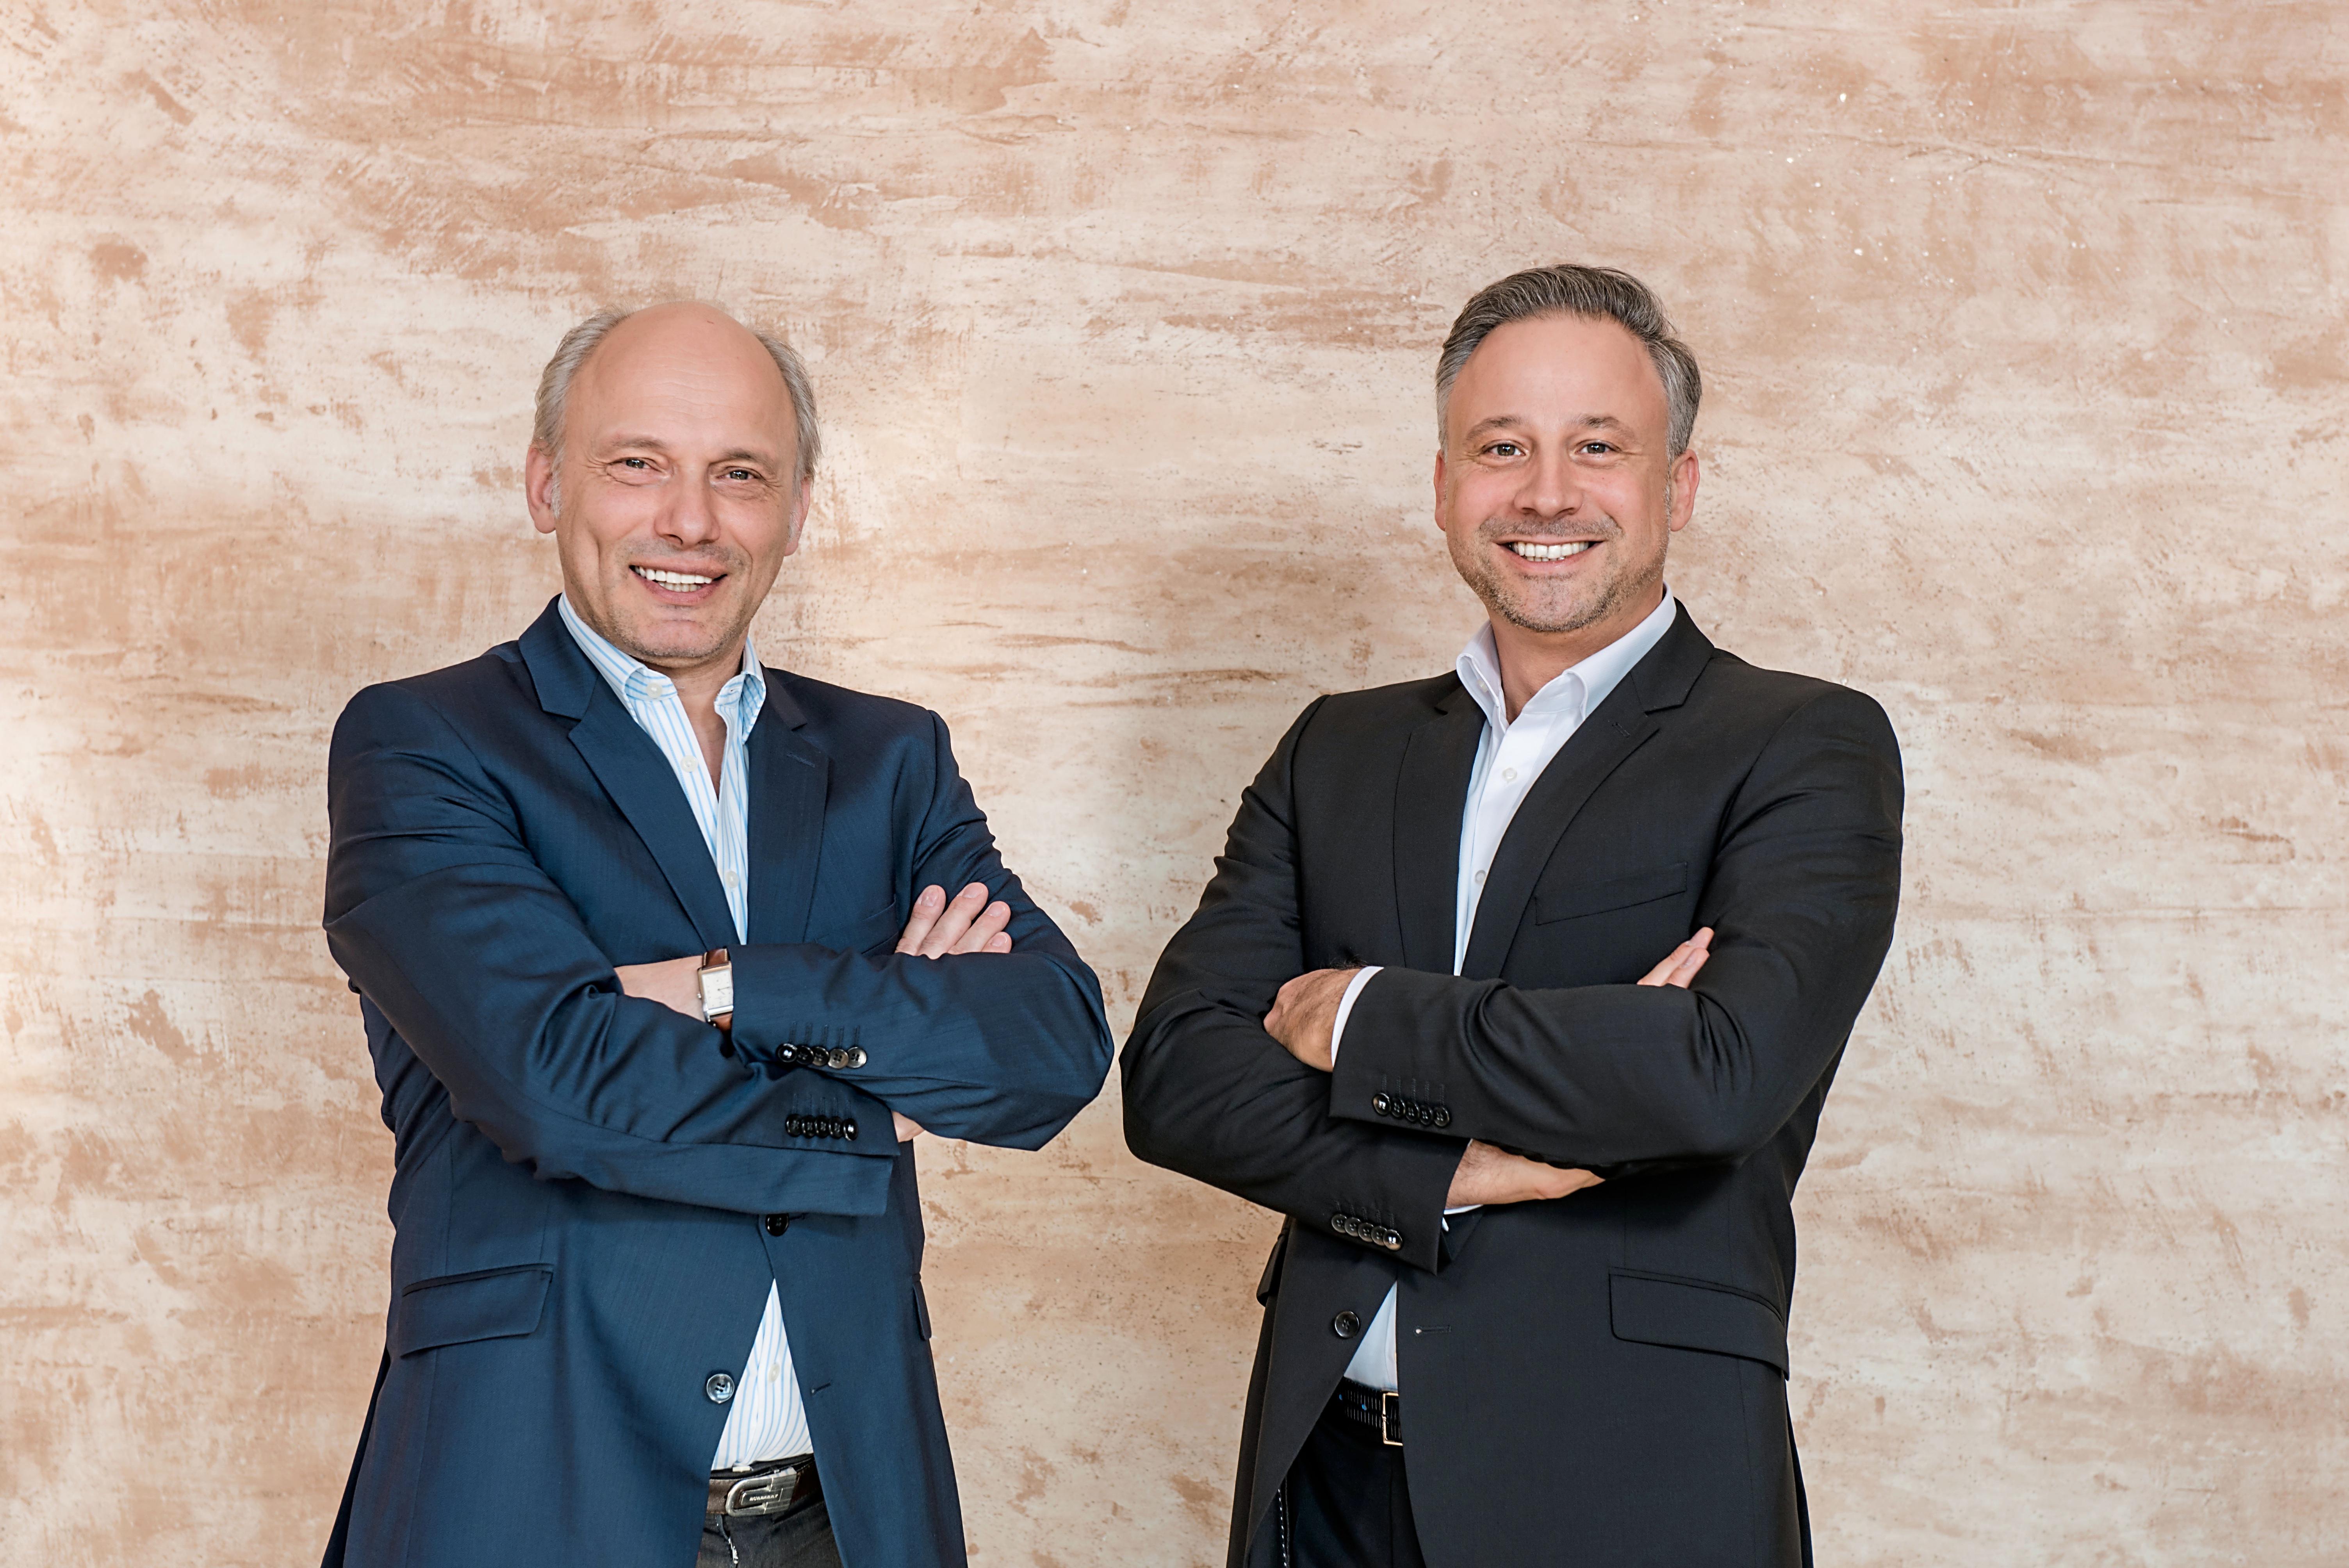 Arved Graf von Stackelberg and Marc Schieder entering the DRACOON Management